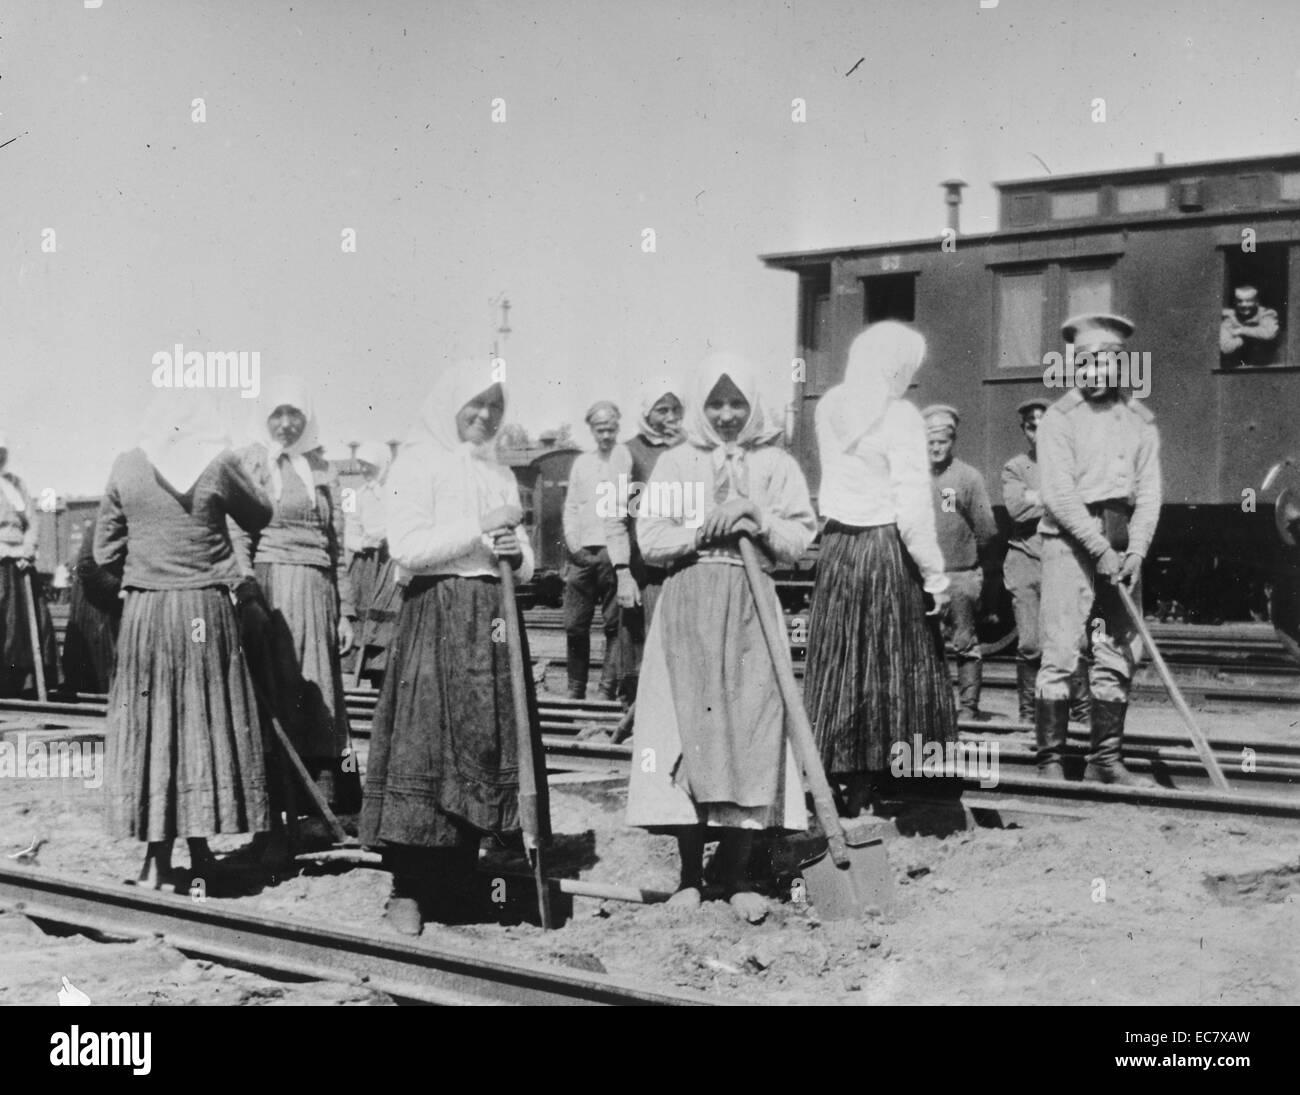 Russian women work on railway tracks as troop train stands nearby; World war One, - Stock Image